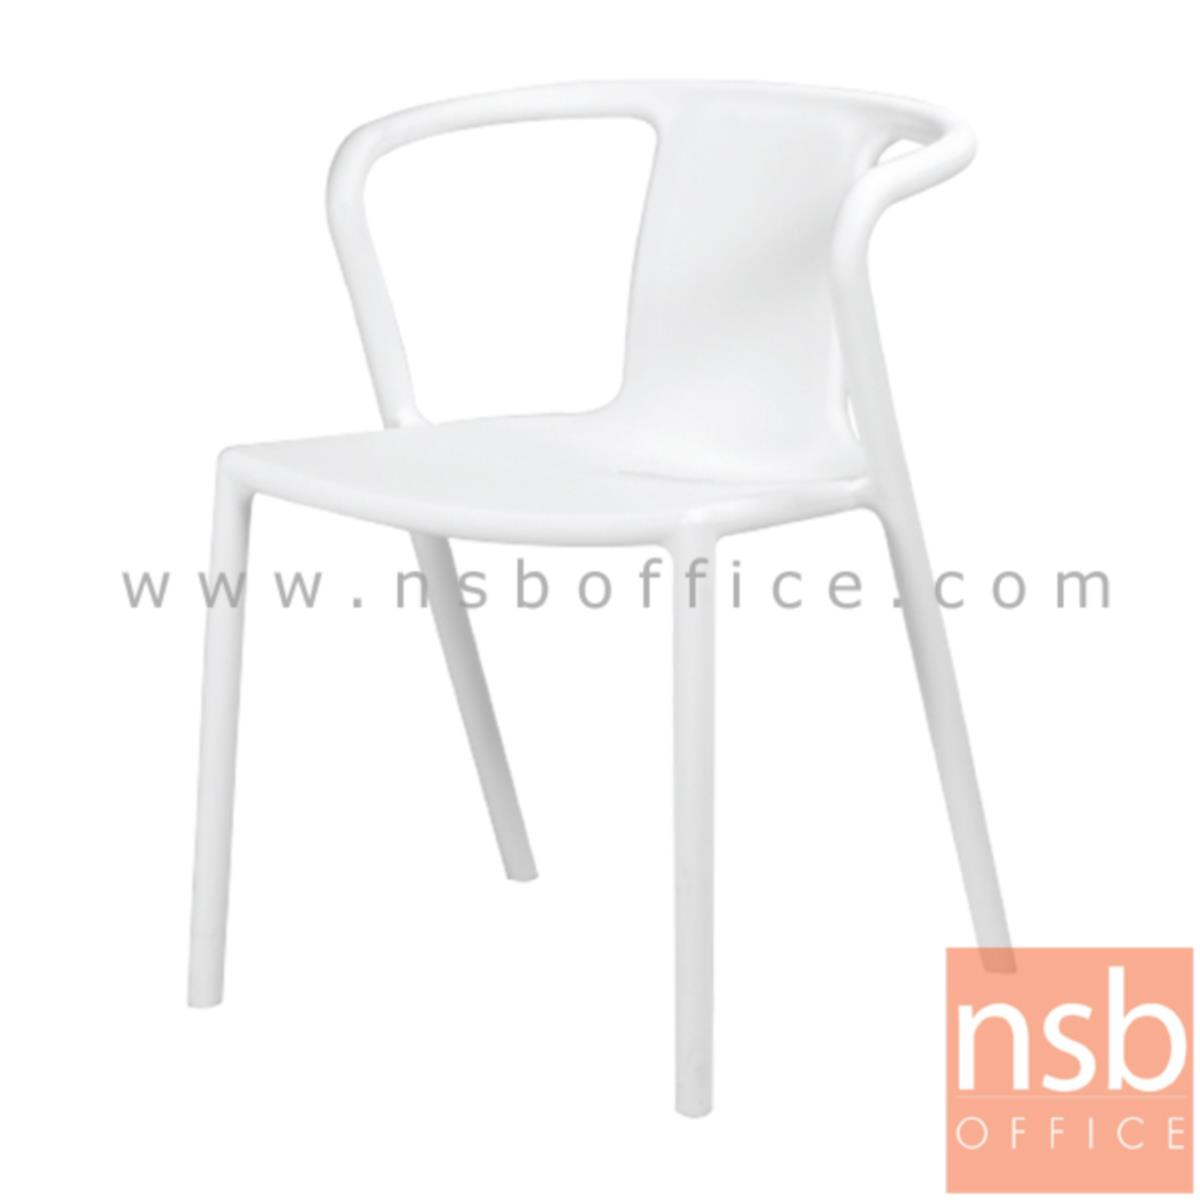 B29A064:เก้าอี้โมเดิร์นพลาสติกโพลี่(PP)ล้วน รุ่น PP9223 ขนาด 52W cm.